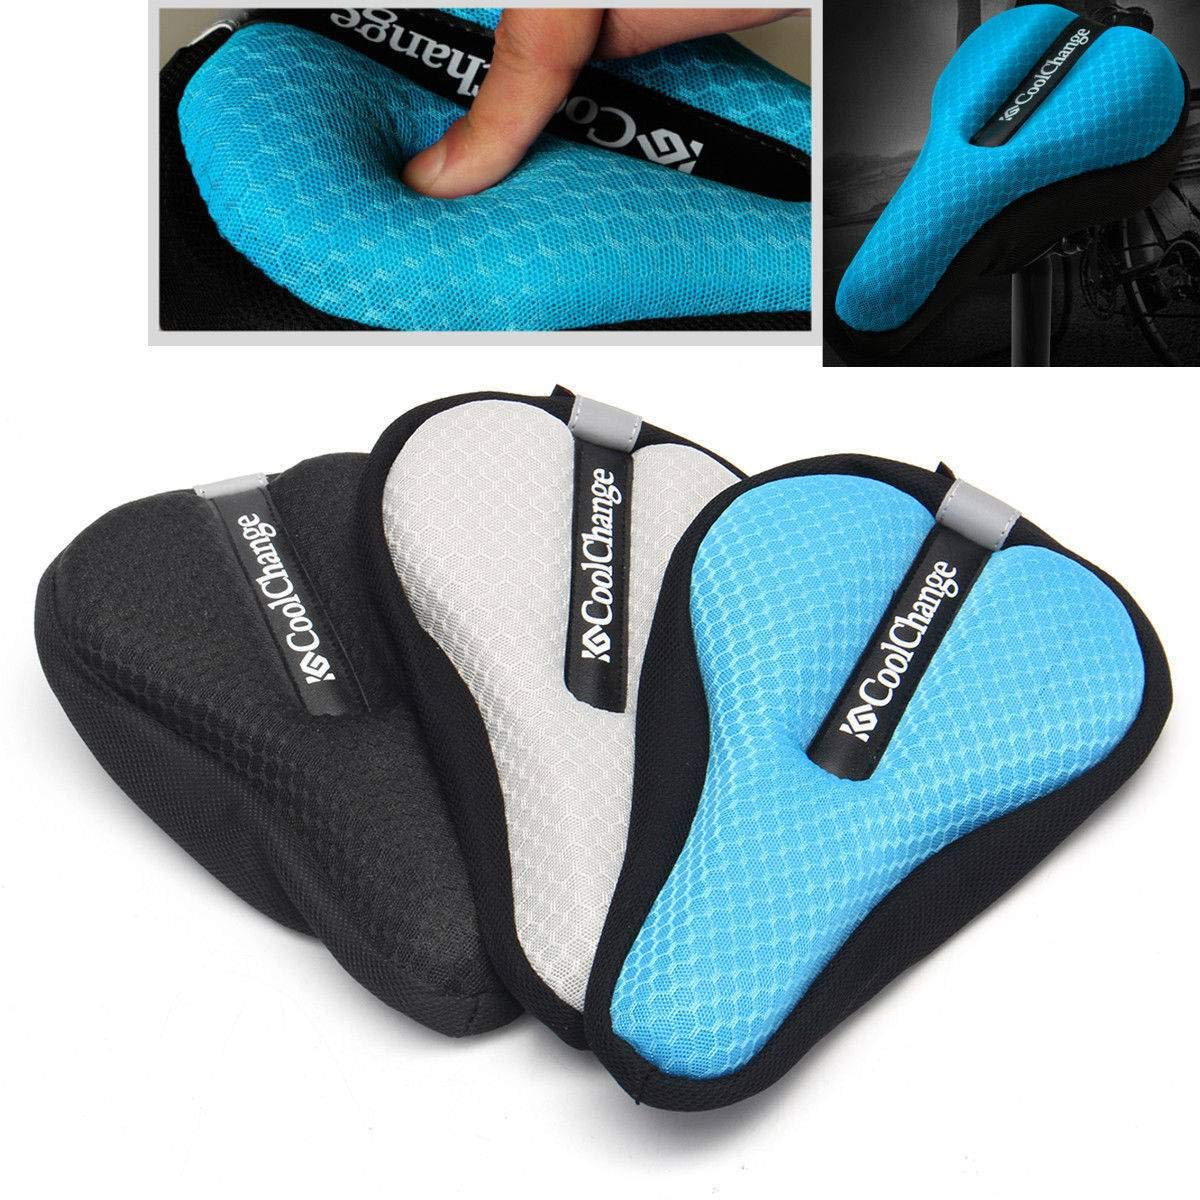 vivpro Silicone Gel Extra Soft Bicycle Bike MTB Saddle Cushion Seat Cover Pad Comfort by vivpro (Image #7)